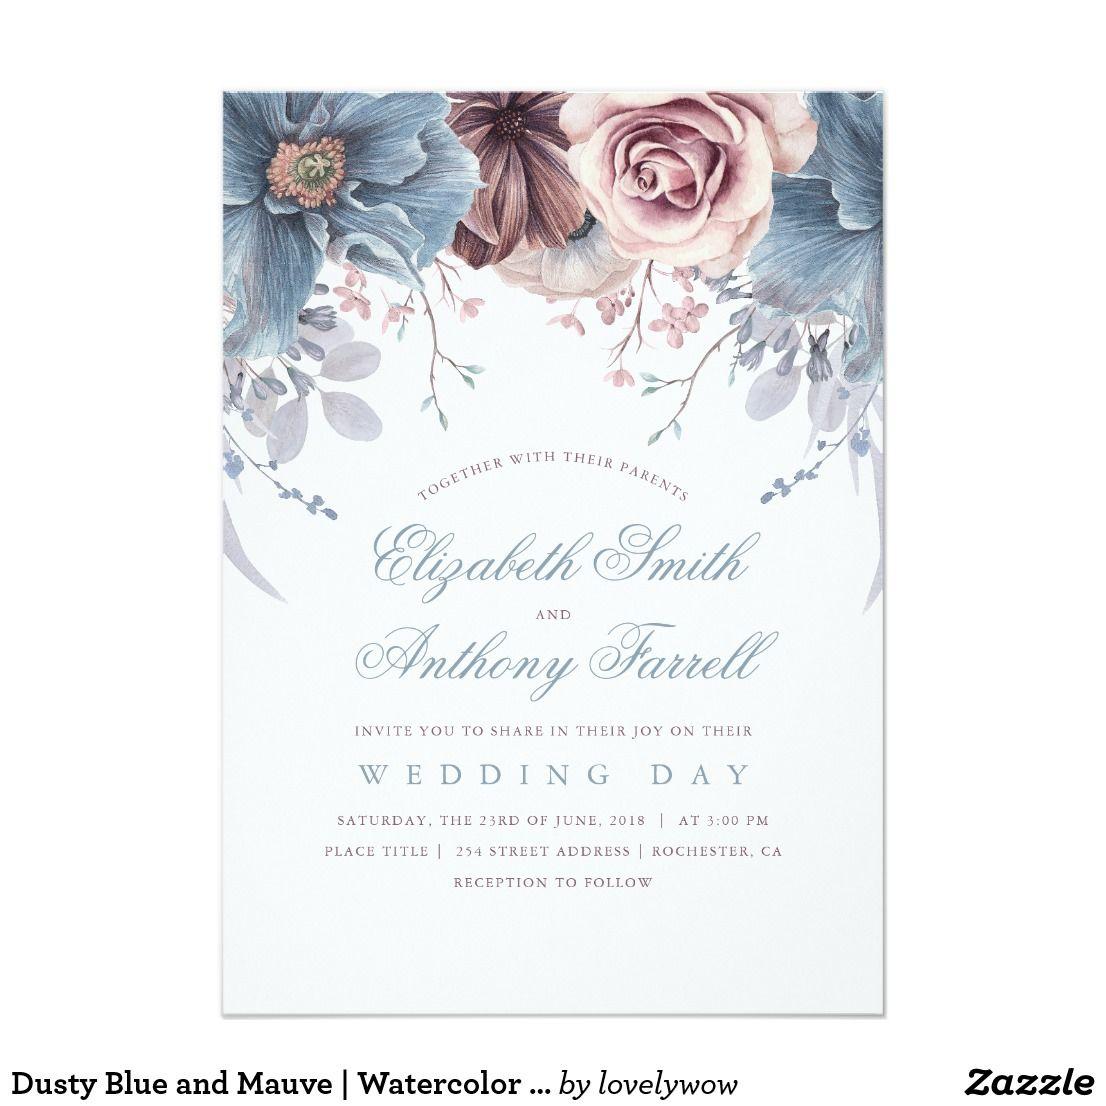 Gold Foil Watercolor Wedding Invitation Sample Wedding